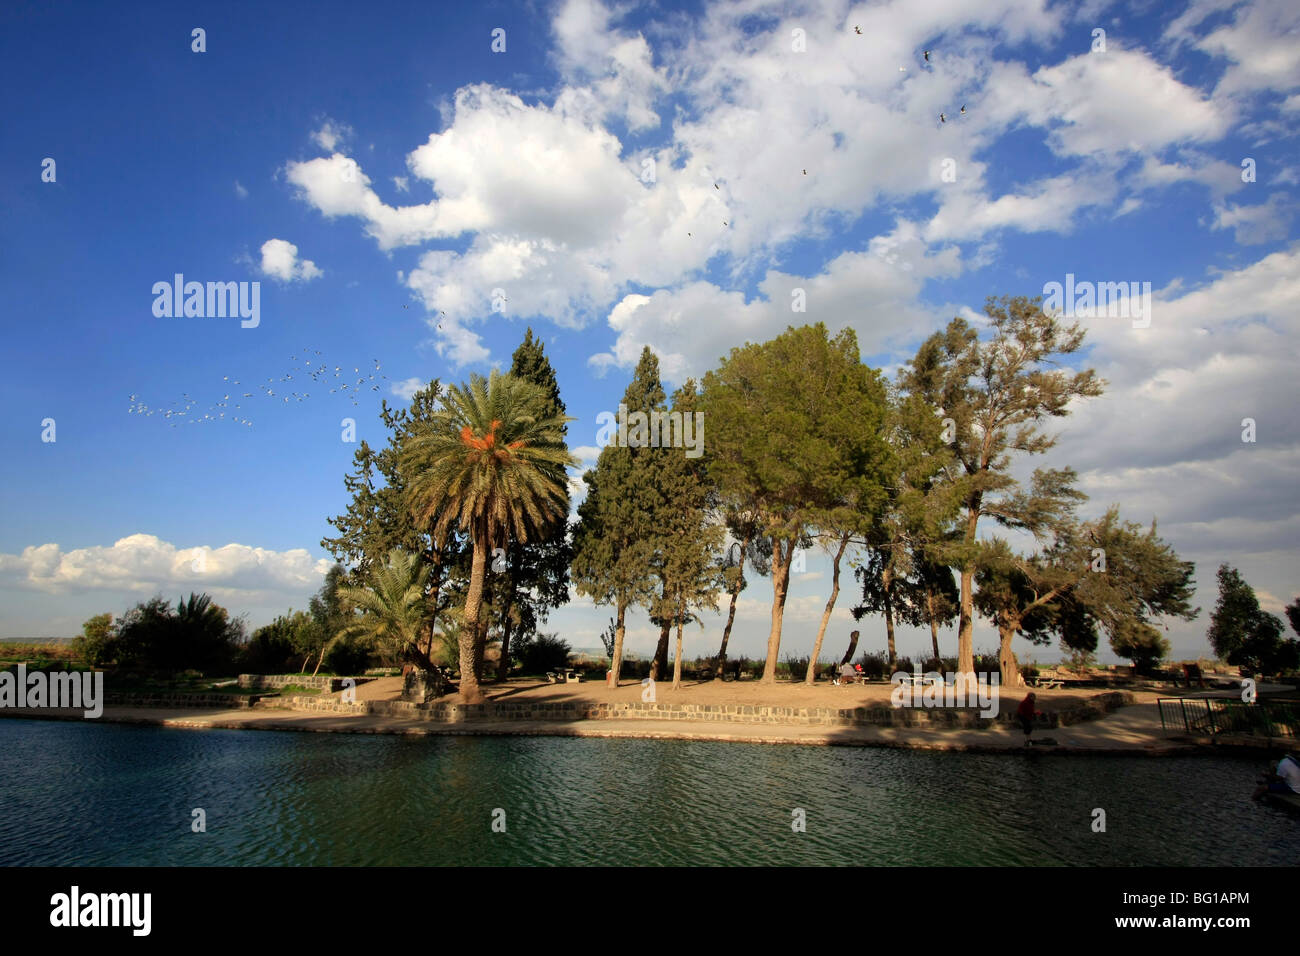 Israel, Beth Shean valle. Ein Moda (Moda primavera). Imagen De Stock